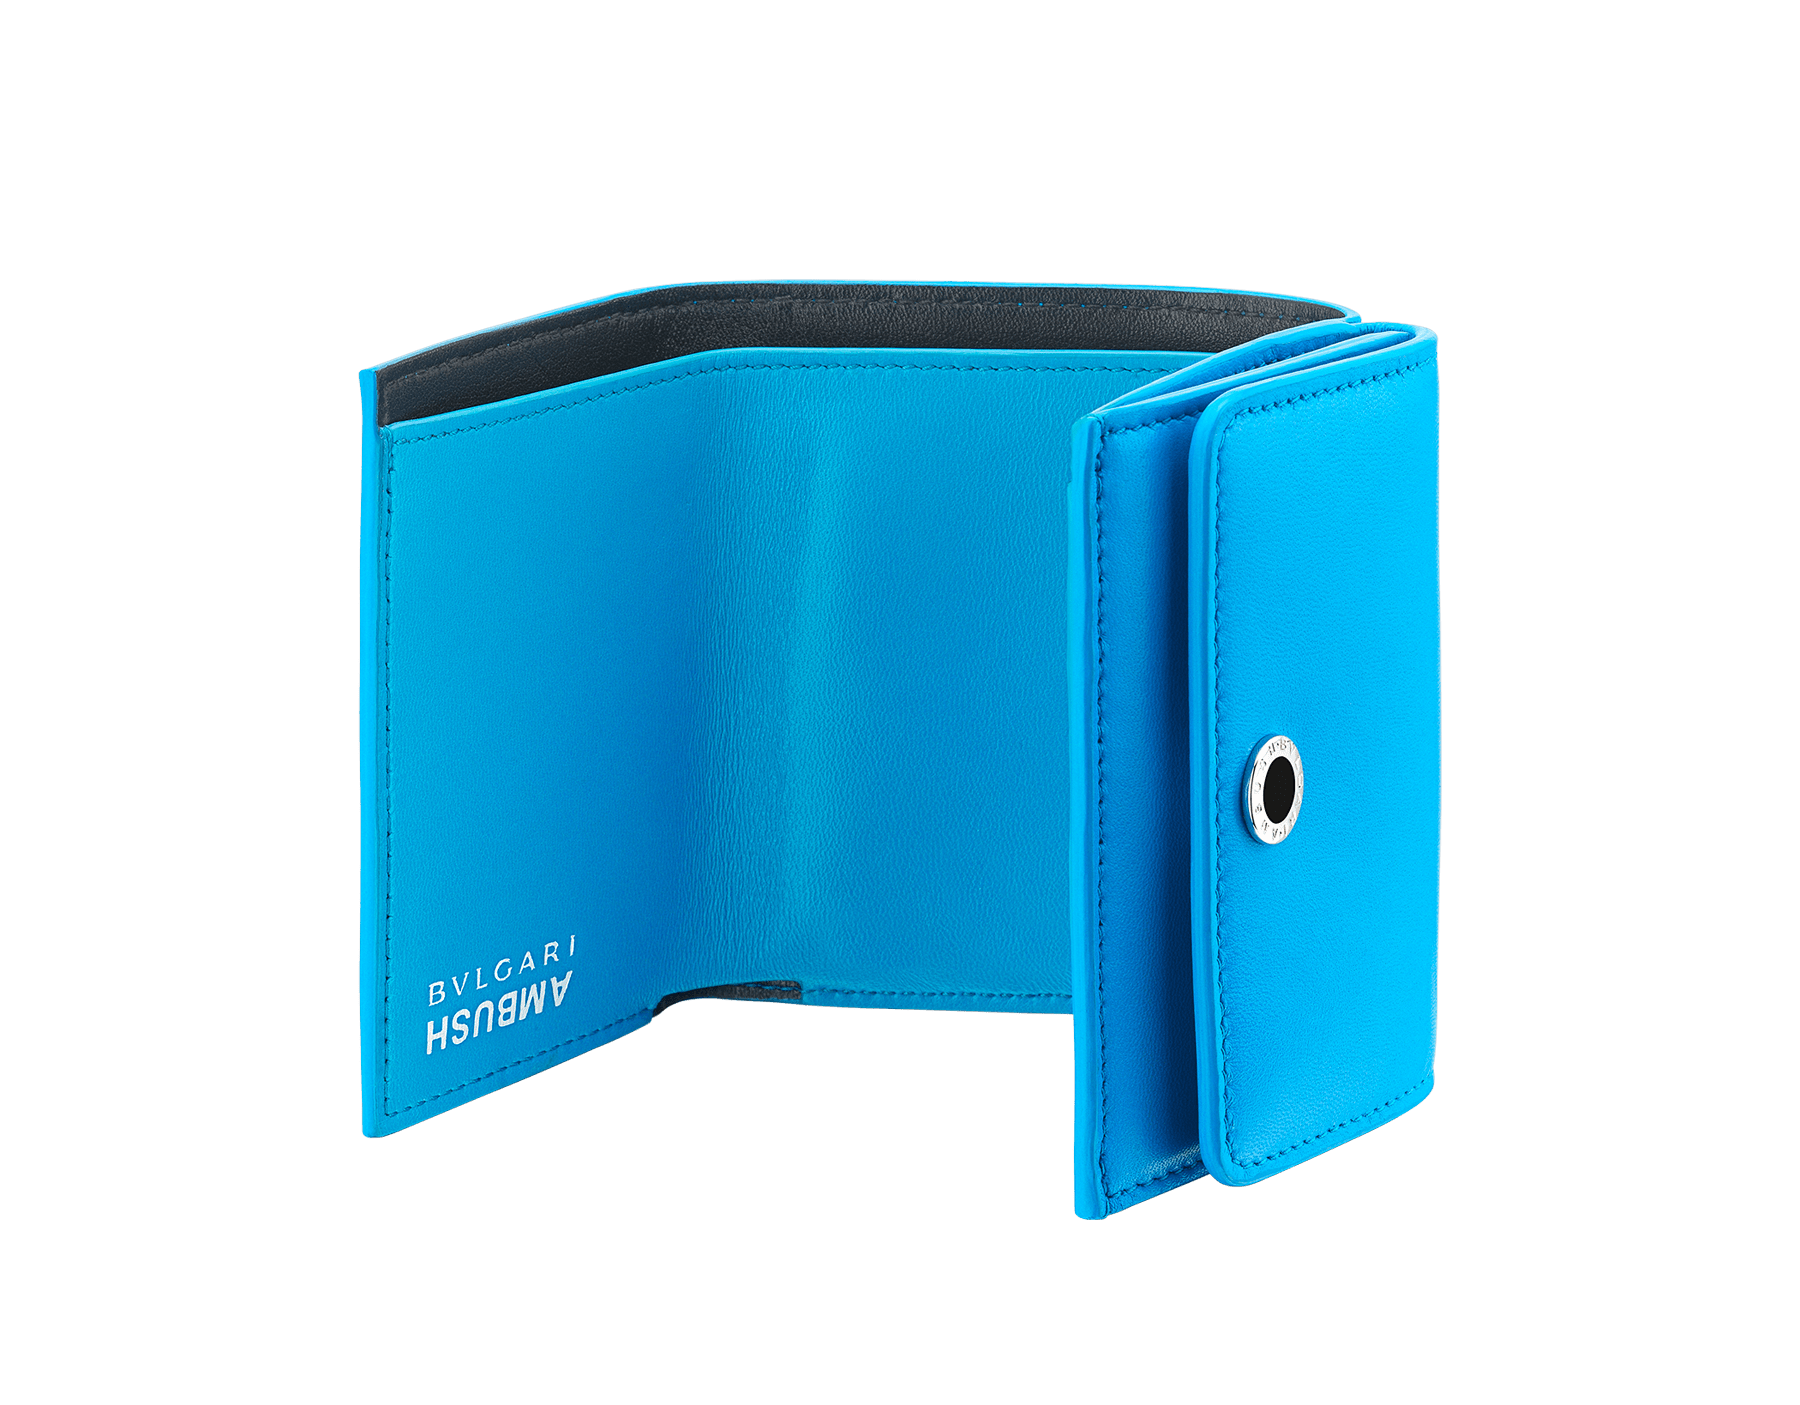 """Ambush x Bvlgari"" mini compact wallet in bright blue nappa leather. Palladium plated brass ""BVLGARI AMBUSH"" décor enameled in black on one side and special ""BVLGARI AMBUSH"" logo print on the other. Limited edition. YA-MINICOMPACT image 2"